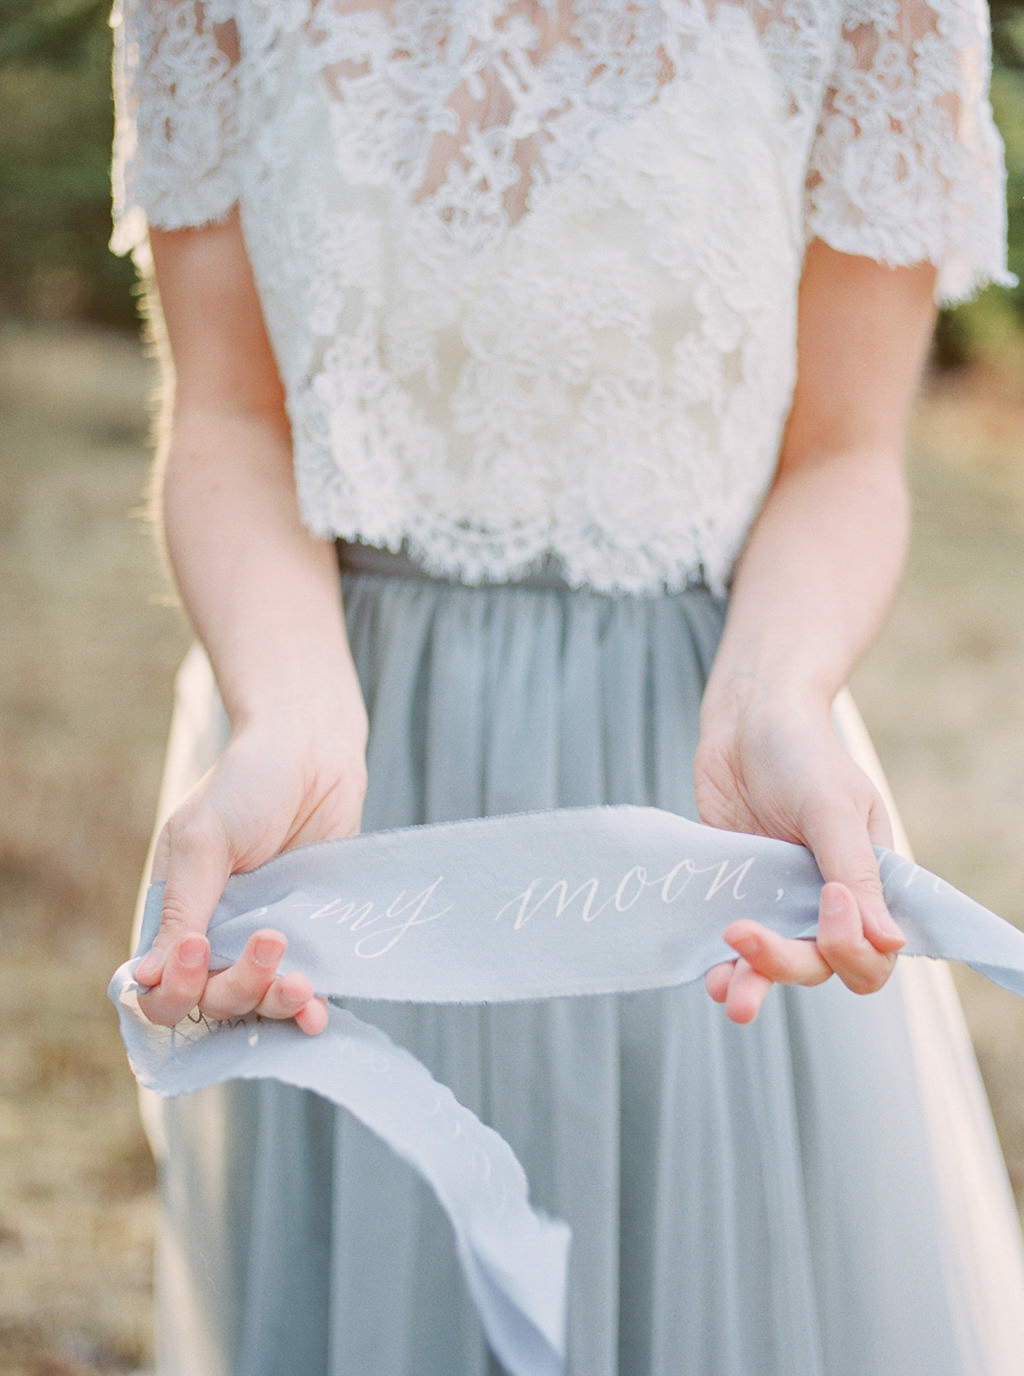 kayla-yestal-photography-vineyard-bride-swish-list-beamer-falls-manor-grimsby-engagement-16.jpg